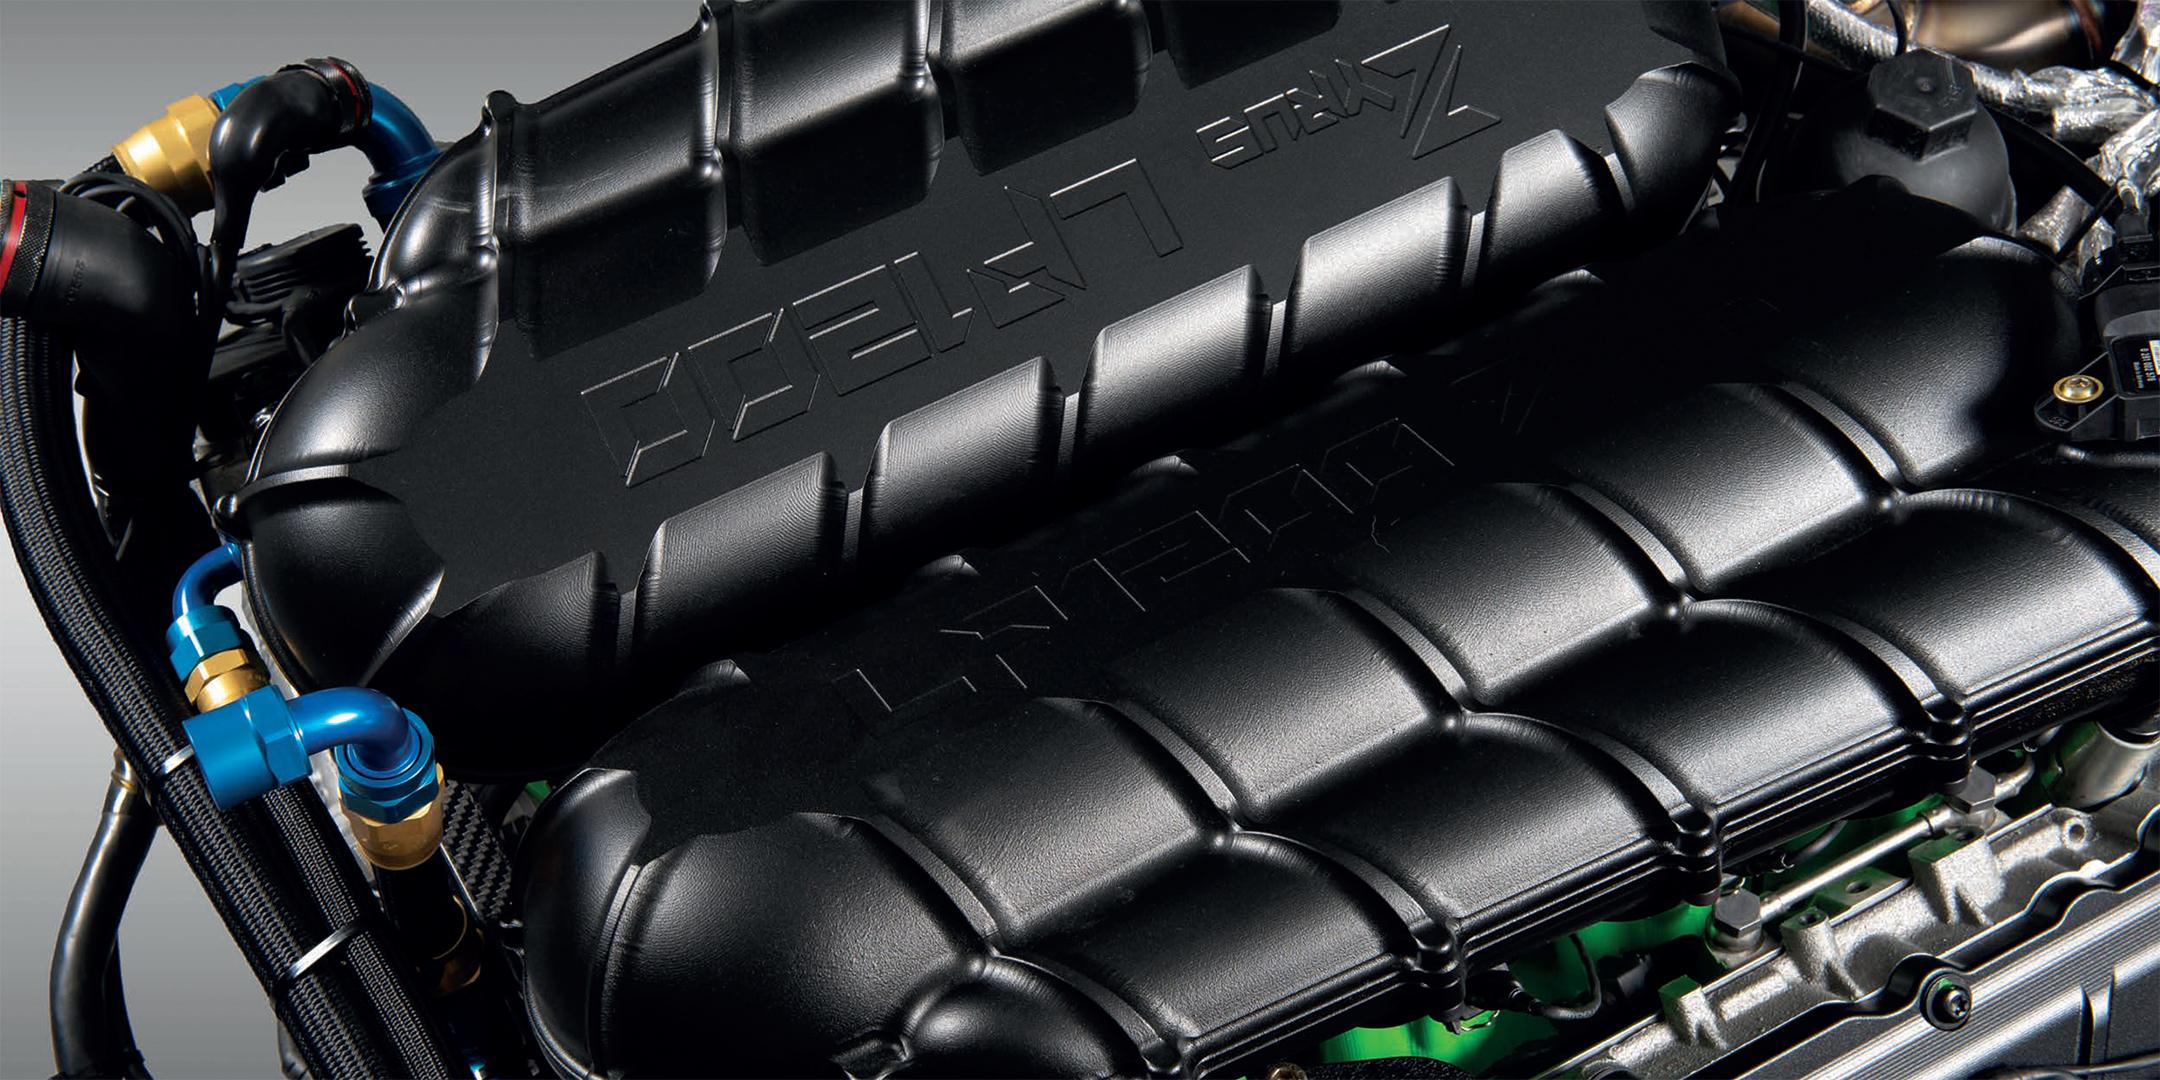 Zyrus LP1200 - 2020 - engine / moteur - V10 5.2L Twin Turbo - billett intake